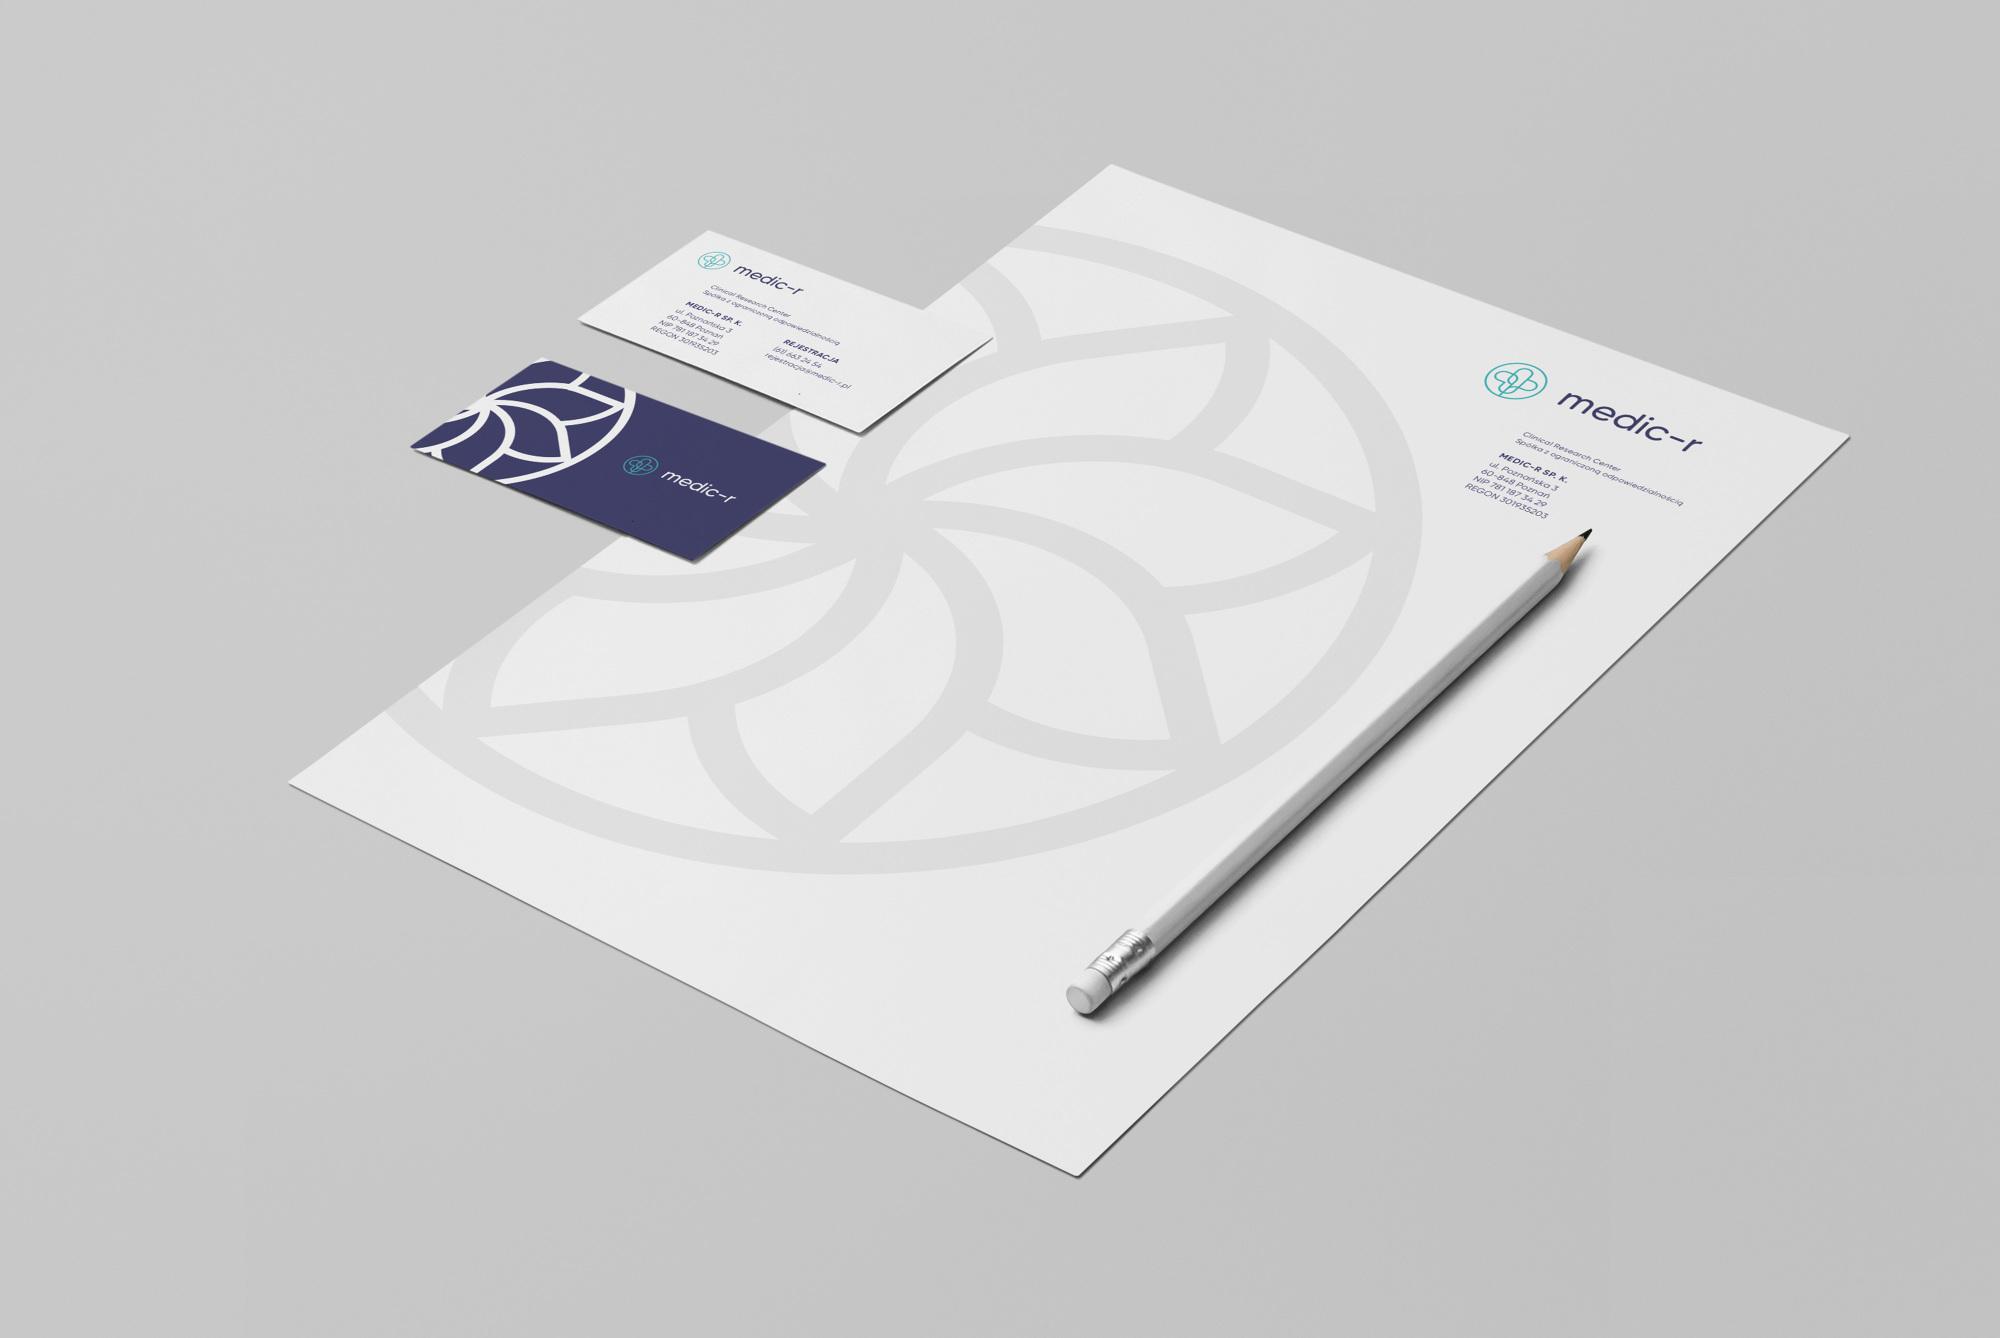 MEDIC-R 私人诊所品牌标识设计©Uniforma